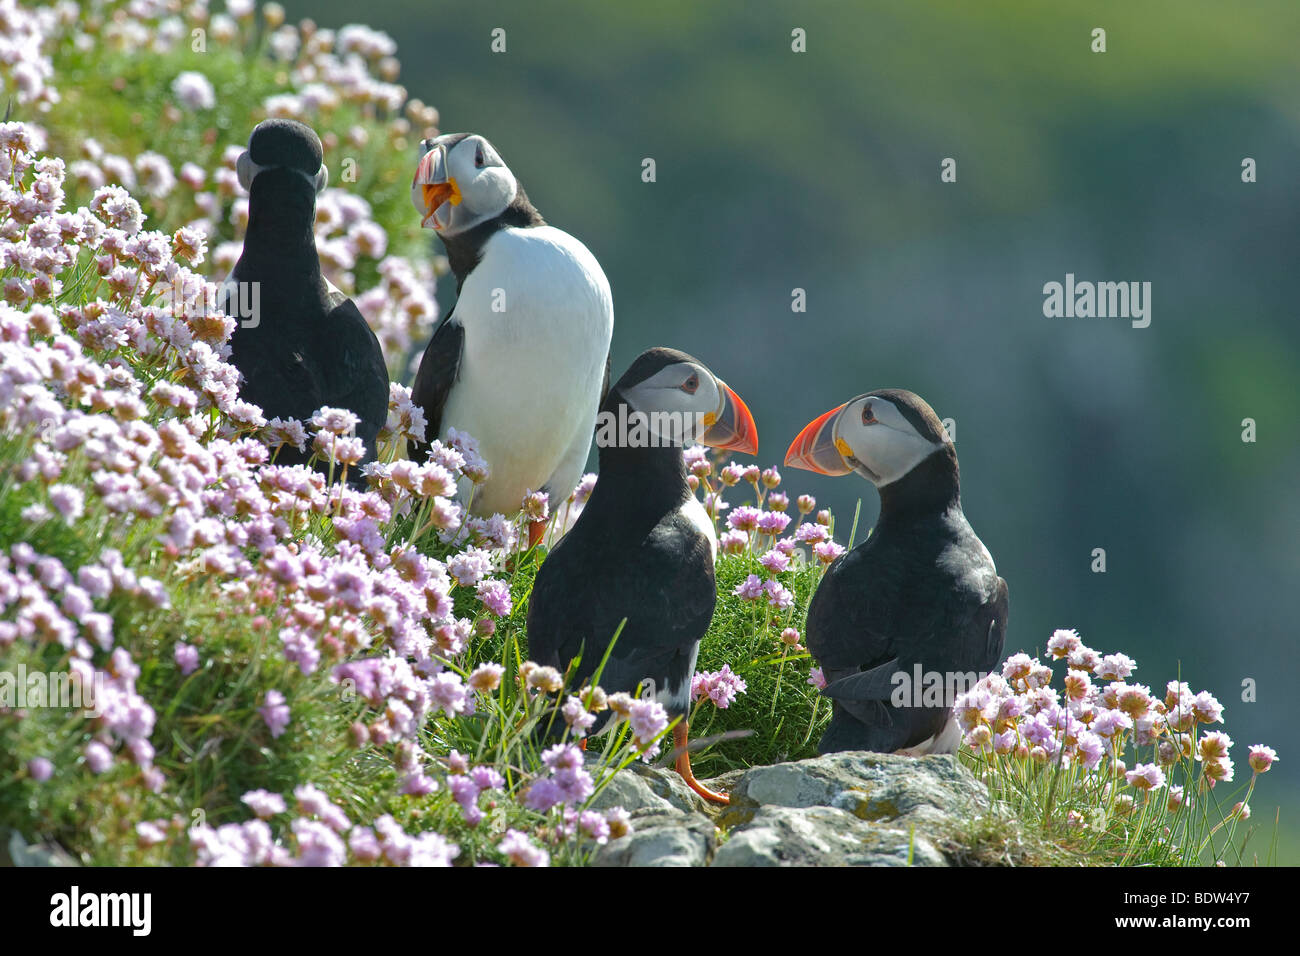 Group of Atlantic puffins Fratercula arctica in thrift Armeria maritima. Scotland. - Stock Image